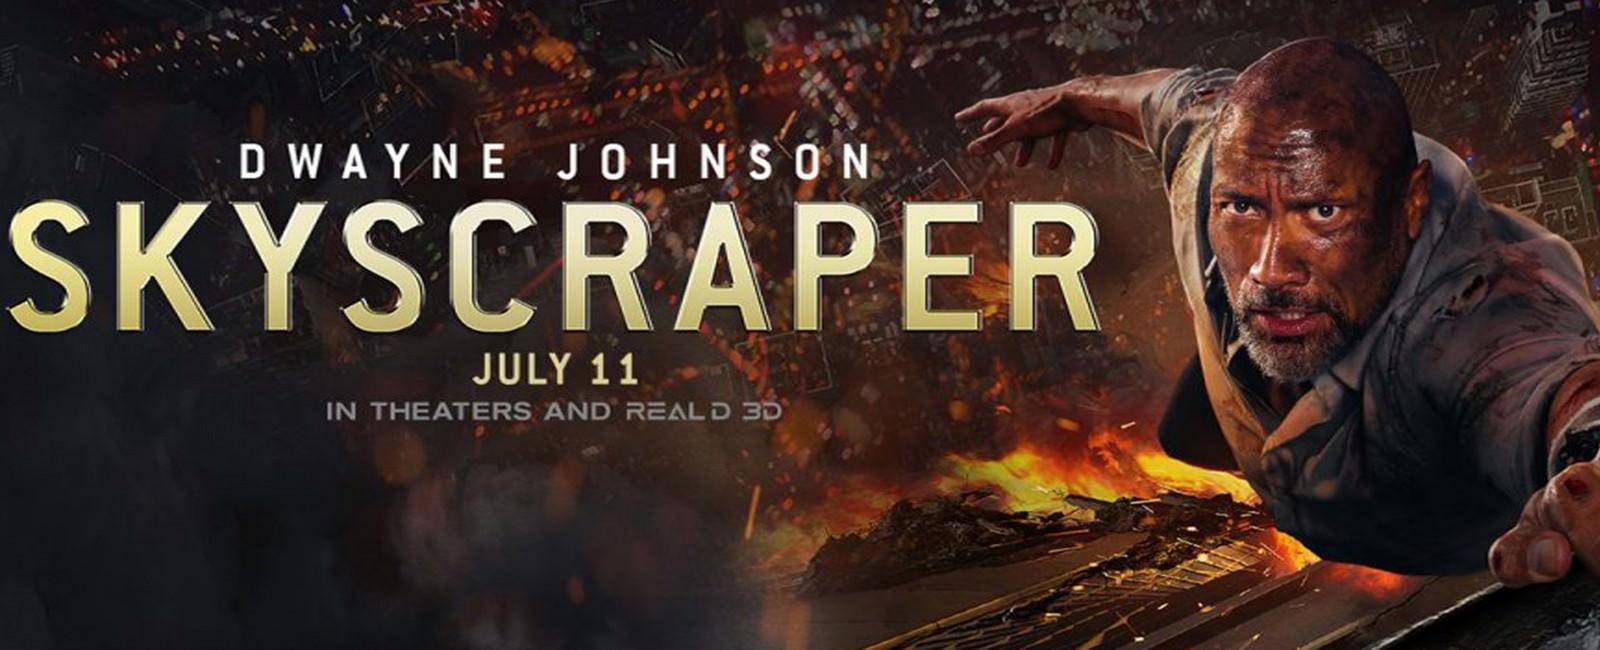 Movie, Skyscraper(美國, 2018) / 摩天大樓(台) / 摩天营救(中) / 高凶浩劫, 電影海報, 美國, 橫版